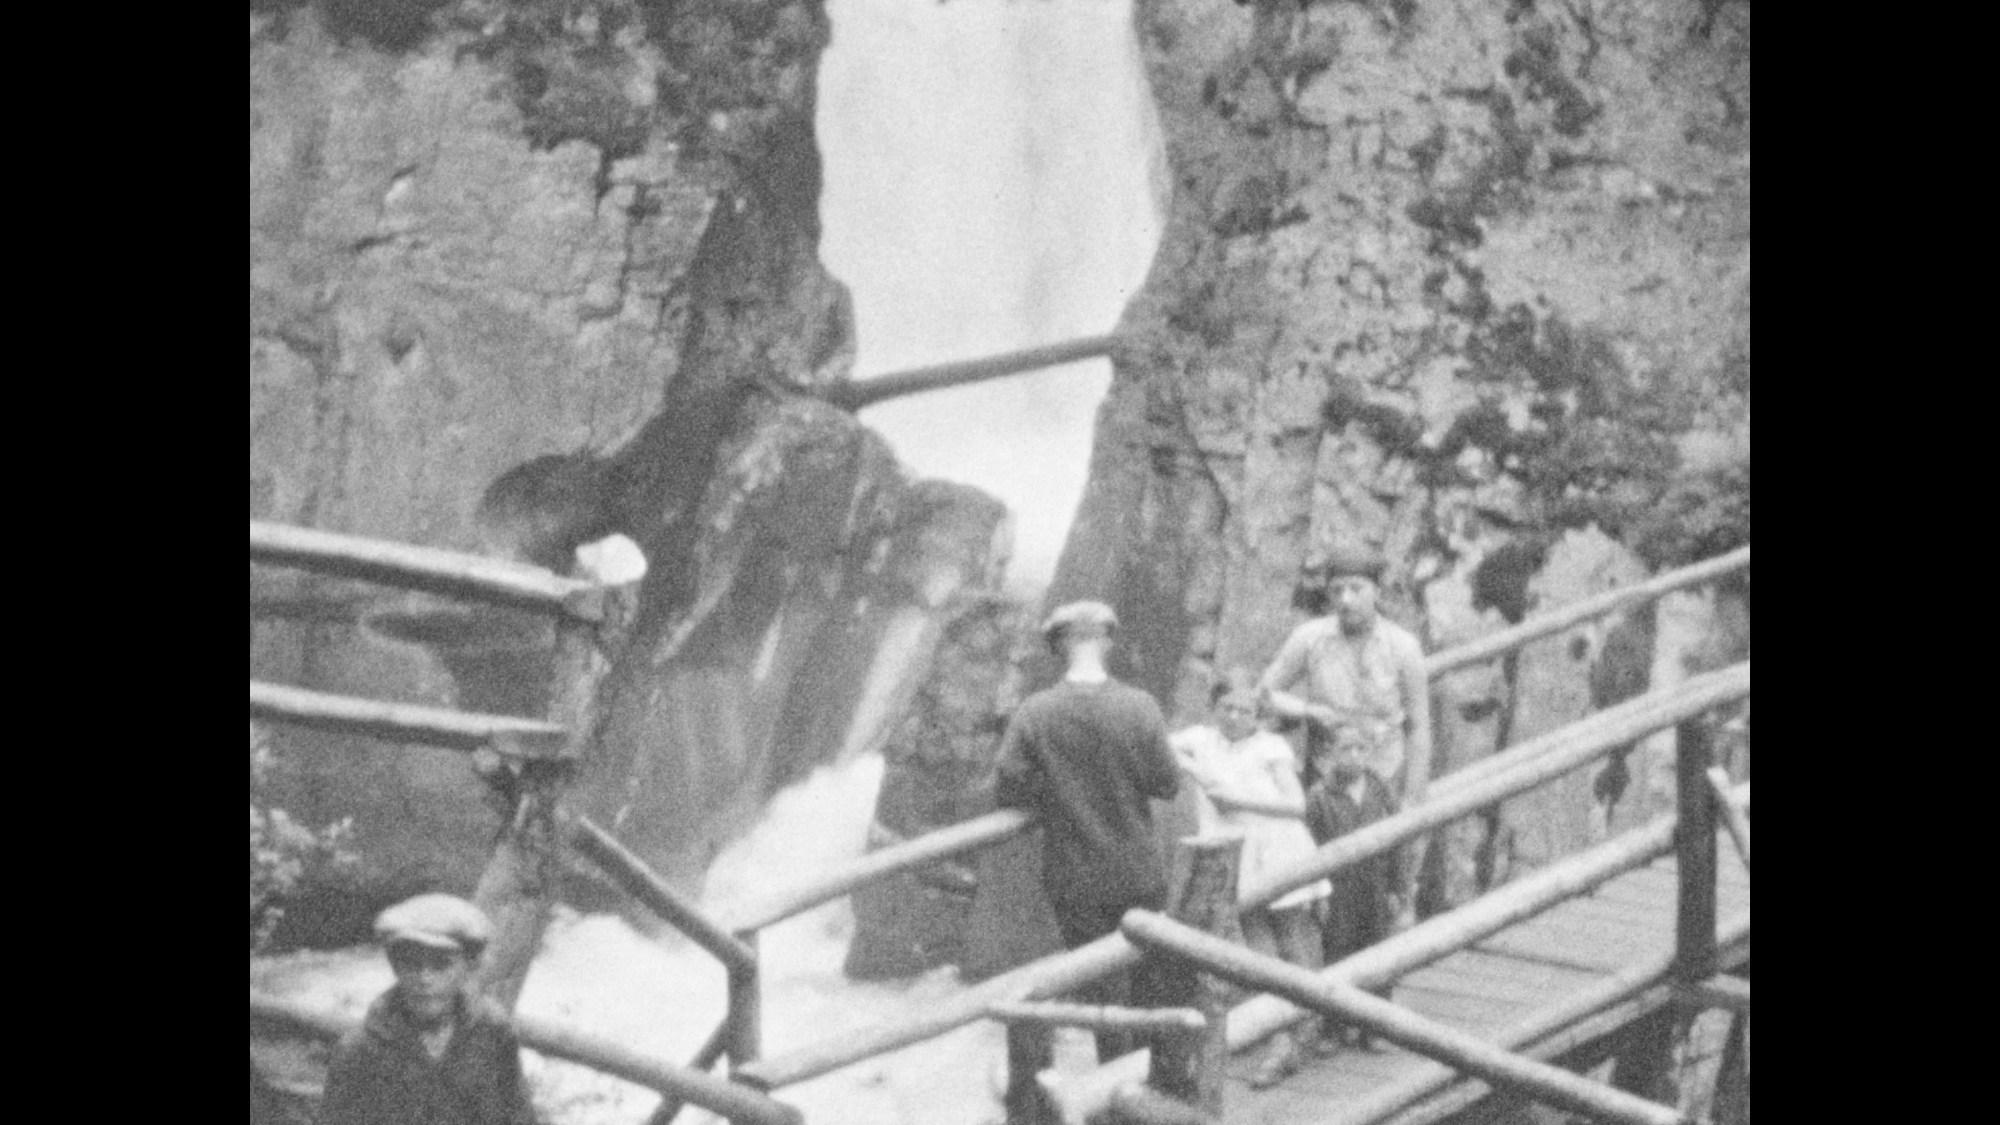 hight resolution of 1920s waterfalls drop below men woman boy and girl on wood bridges